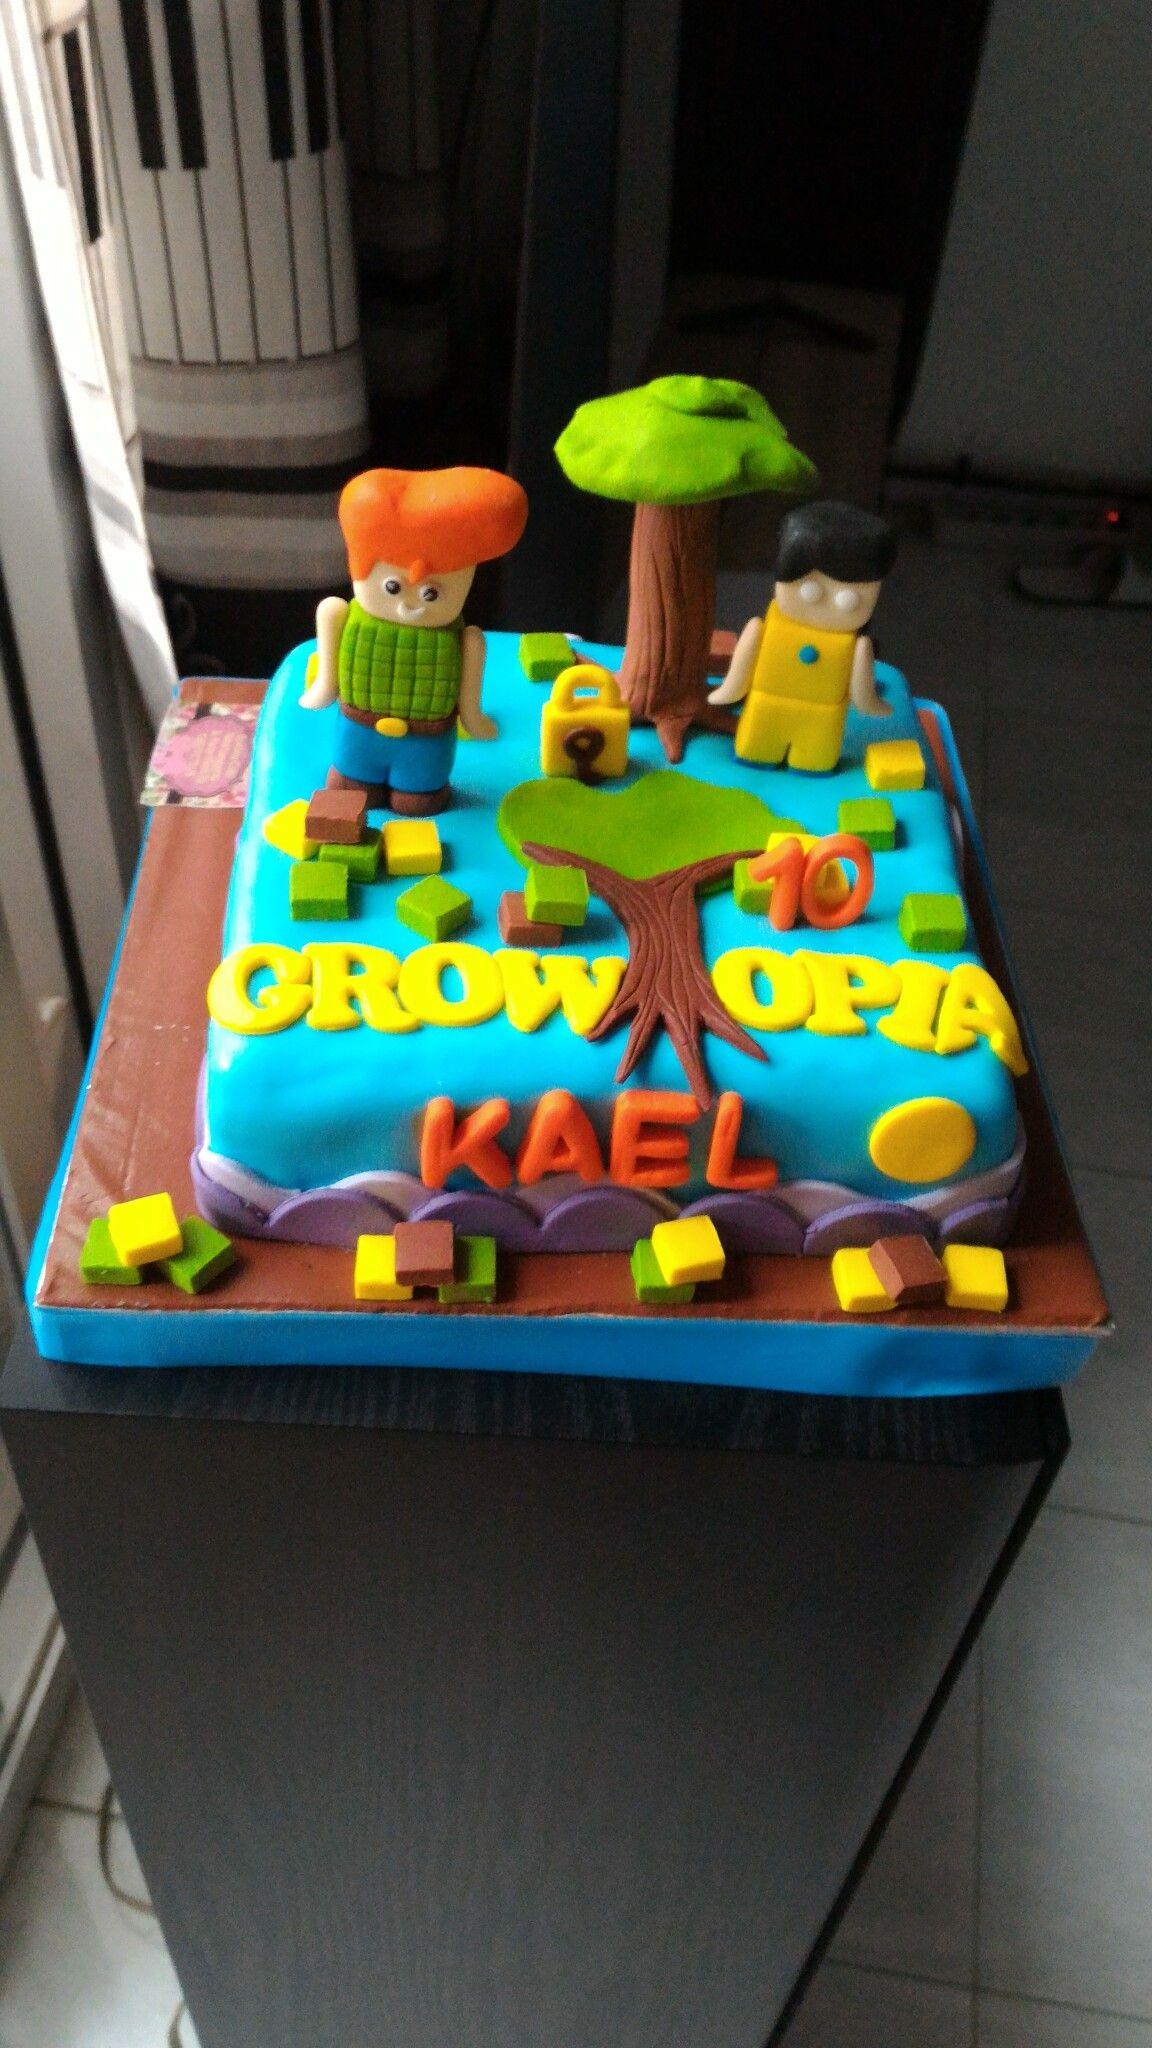 Growtopia fondant cake for kael free pattern pinterest growtopia fondant cake for kael forumfinder Choice Image